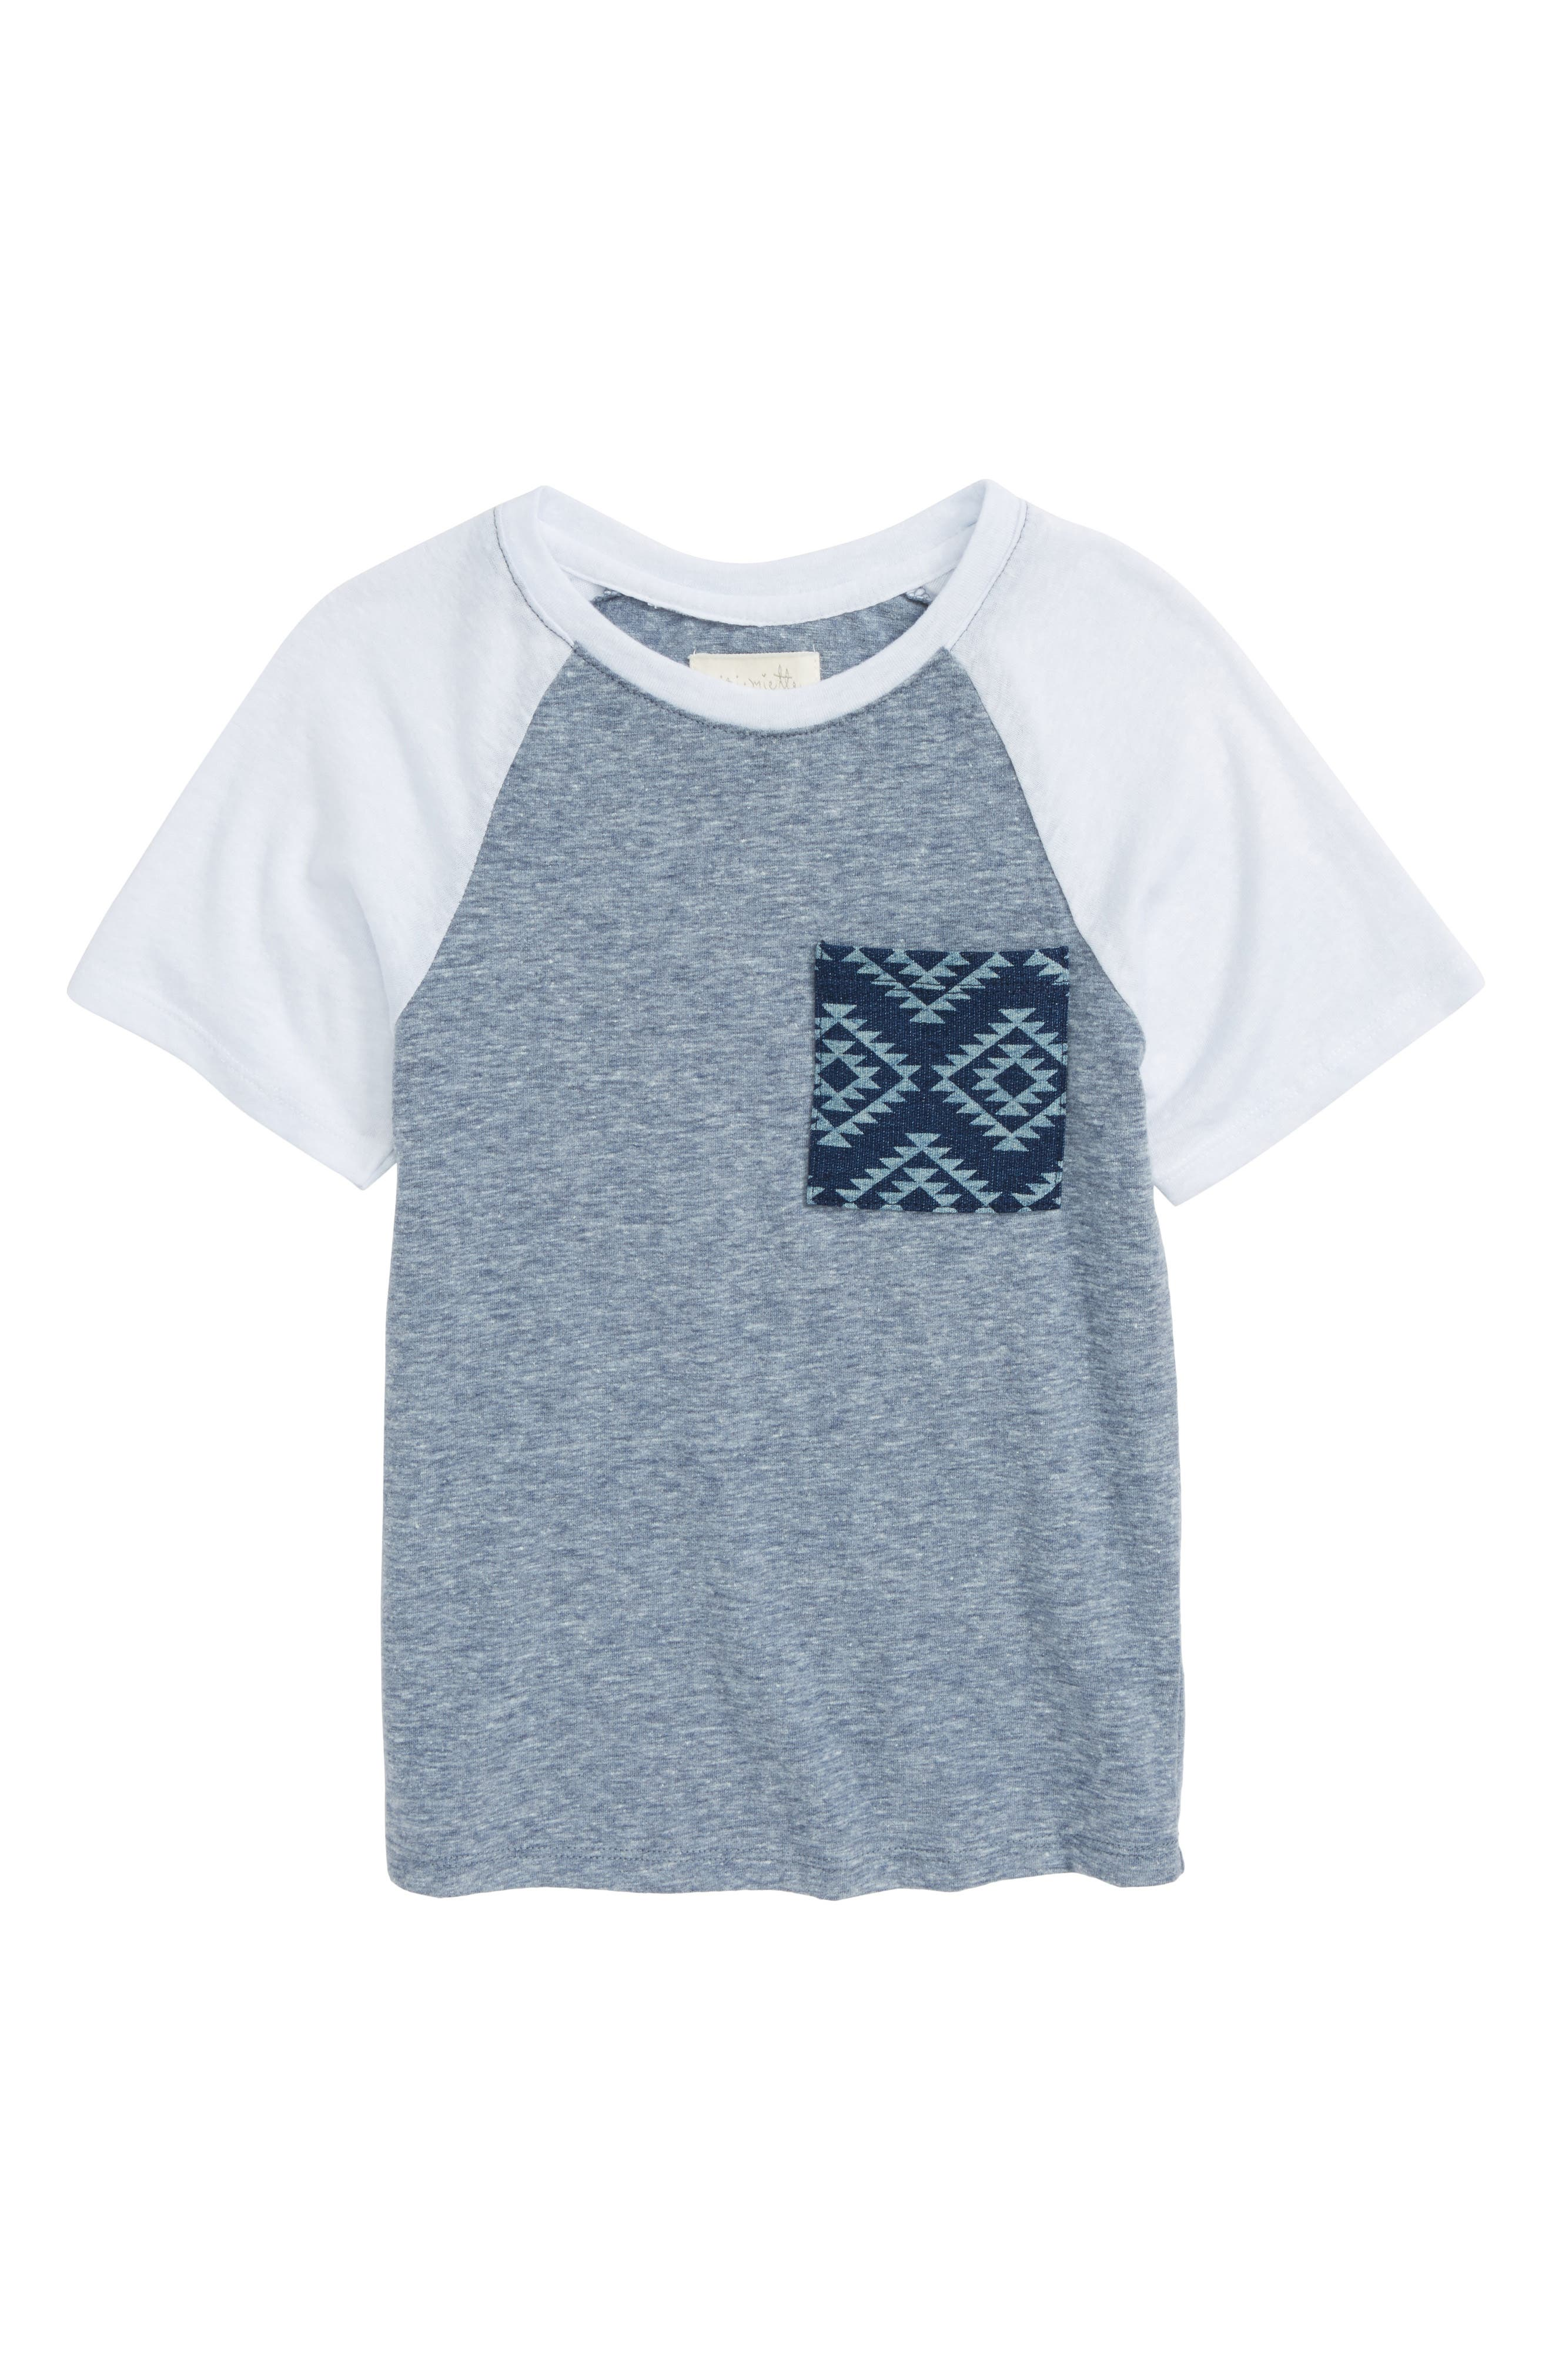 Sydney Pocket T-Shirt,                             Main thumbnail 1, color,                             Yuma